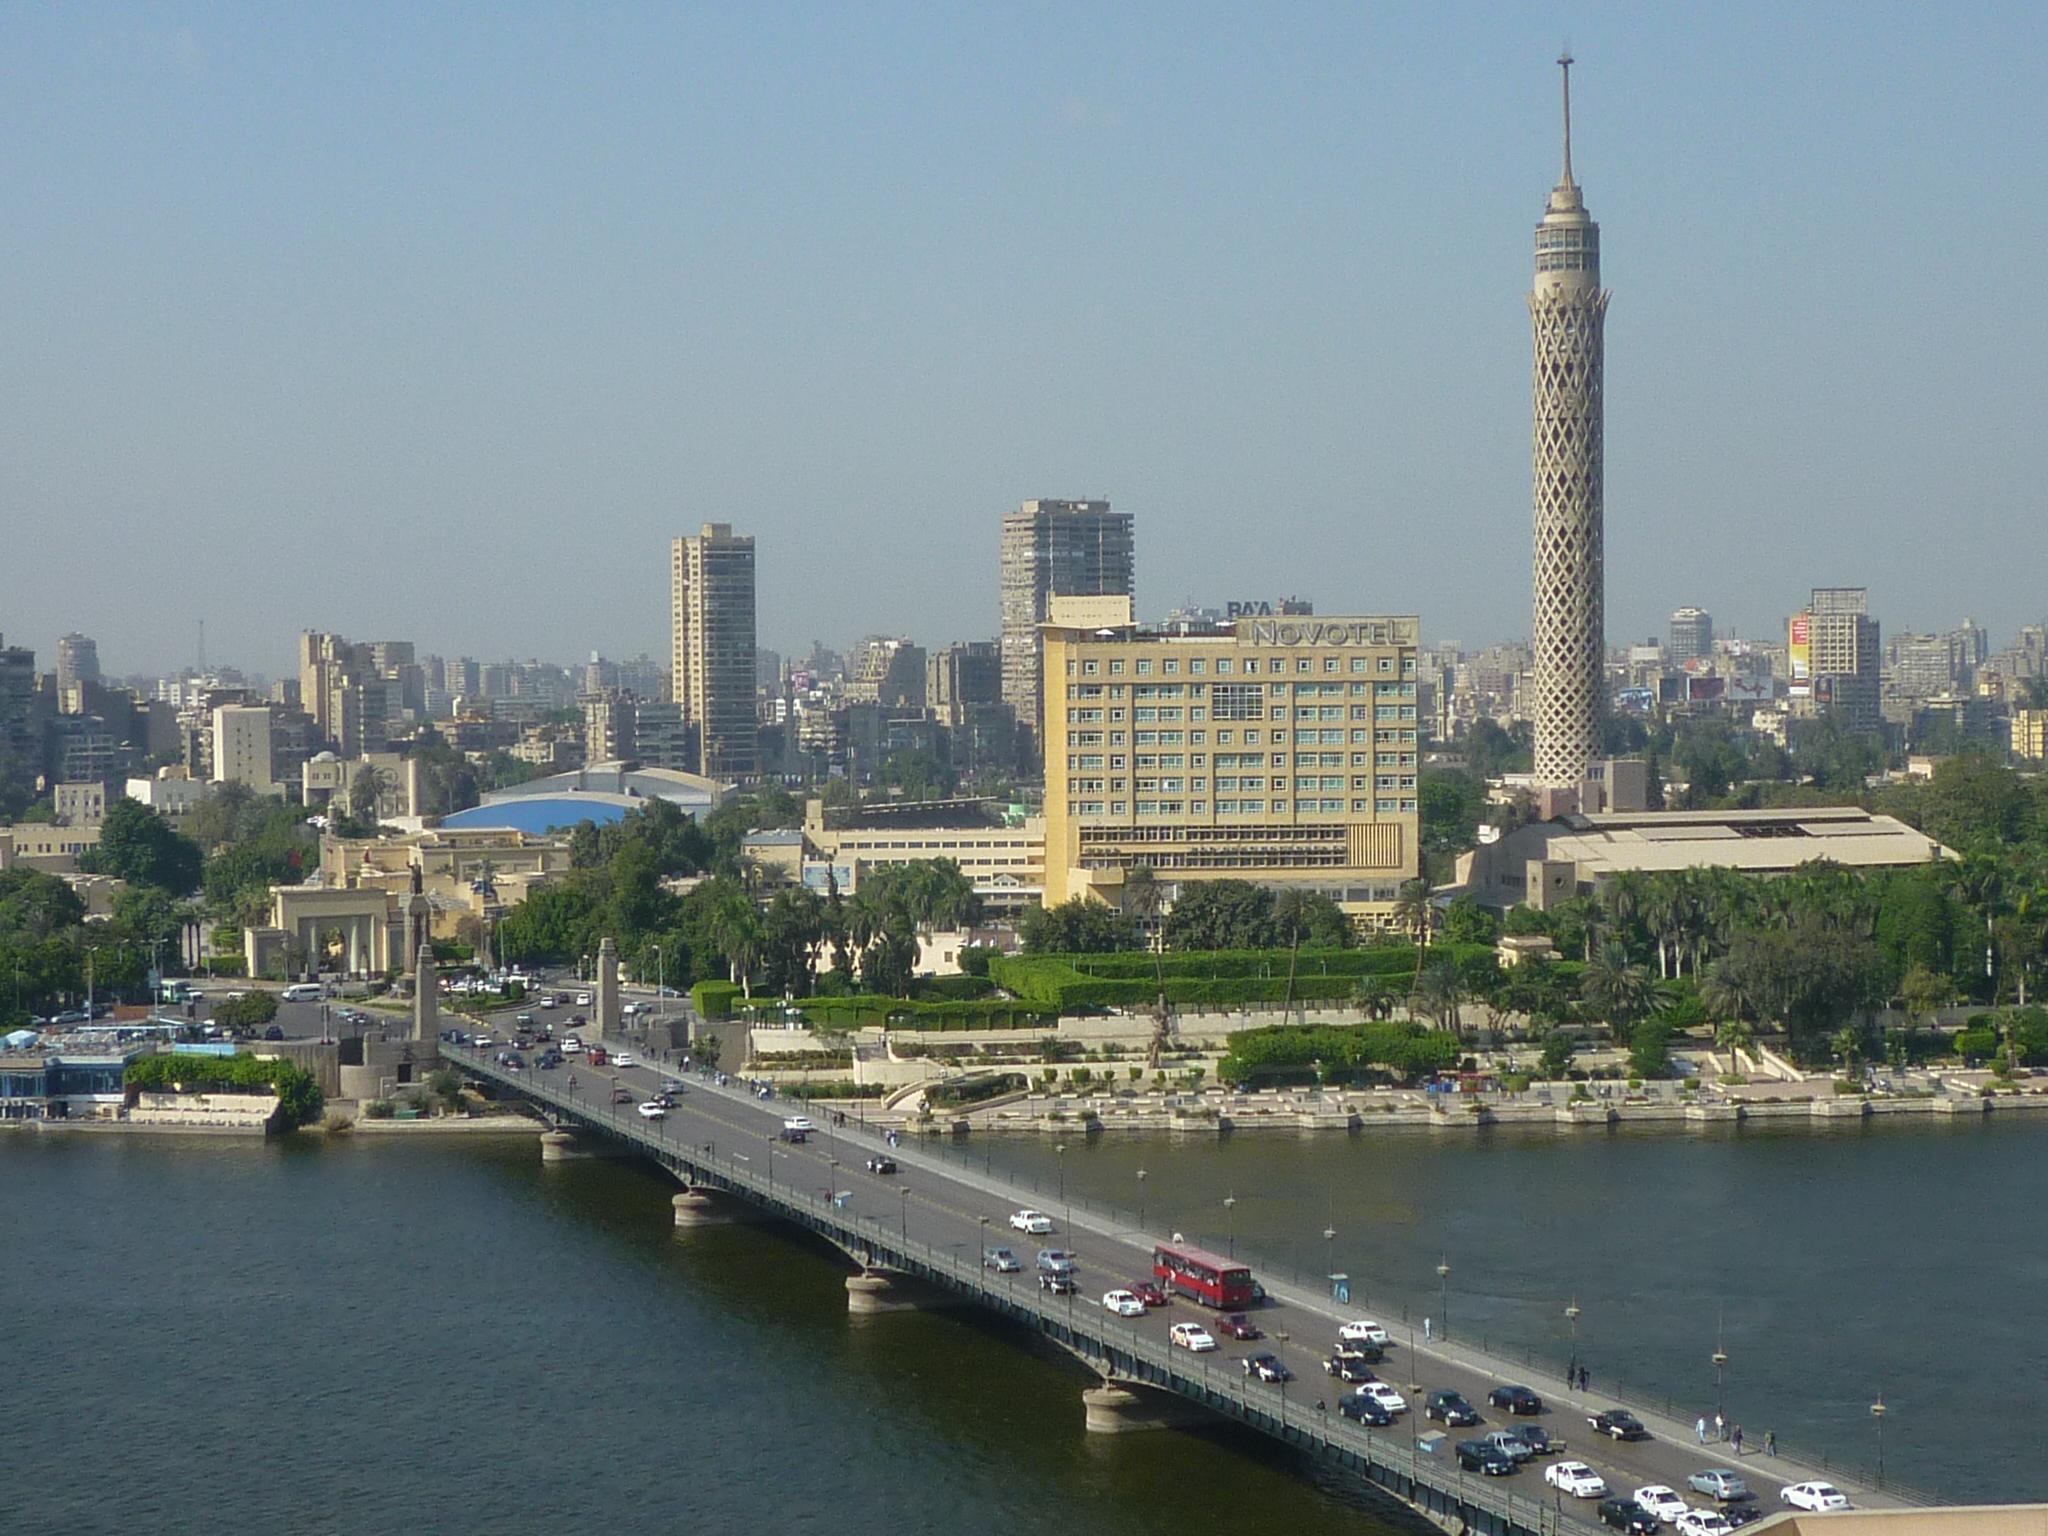 Cairo tours, cairo city breaks